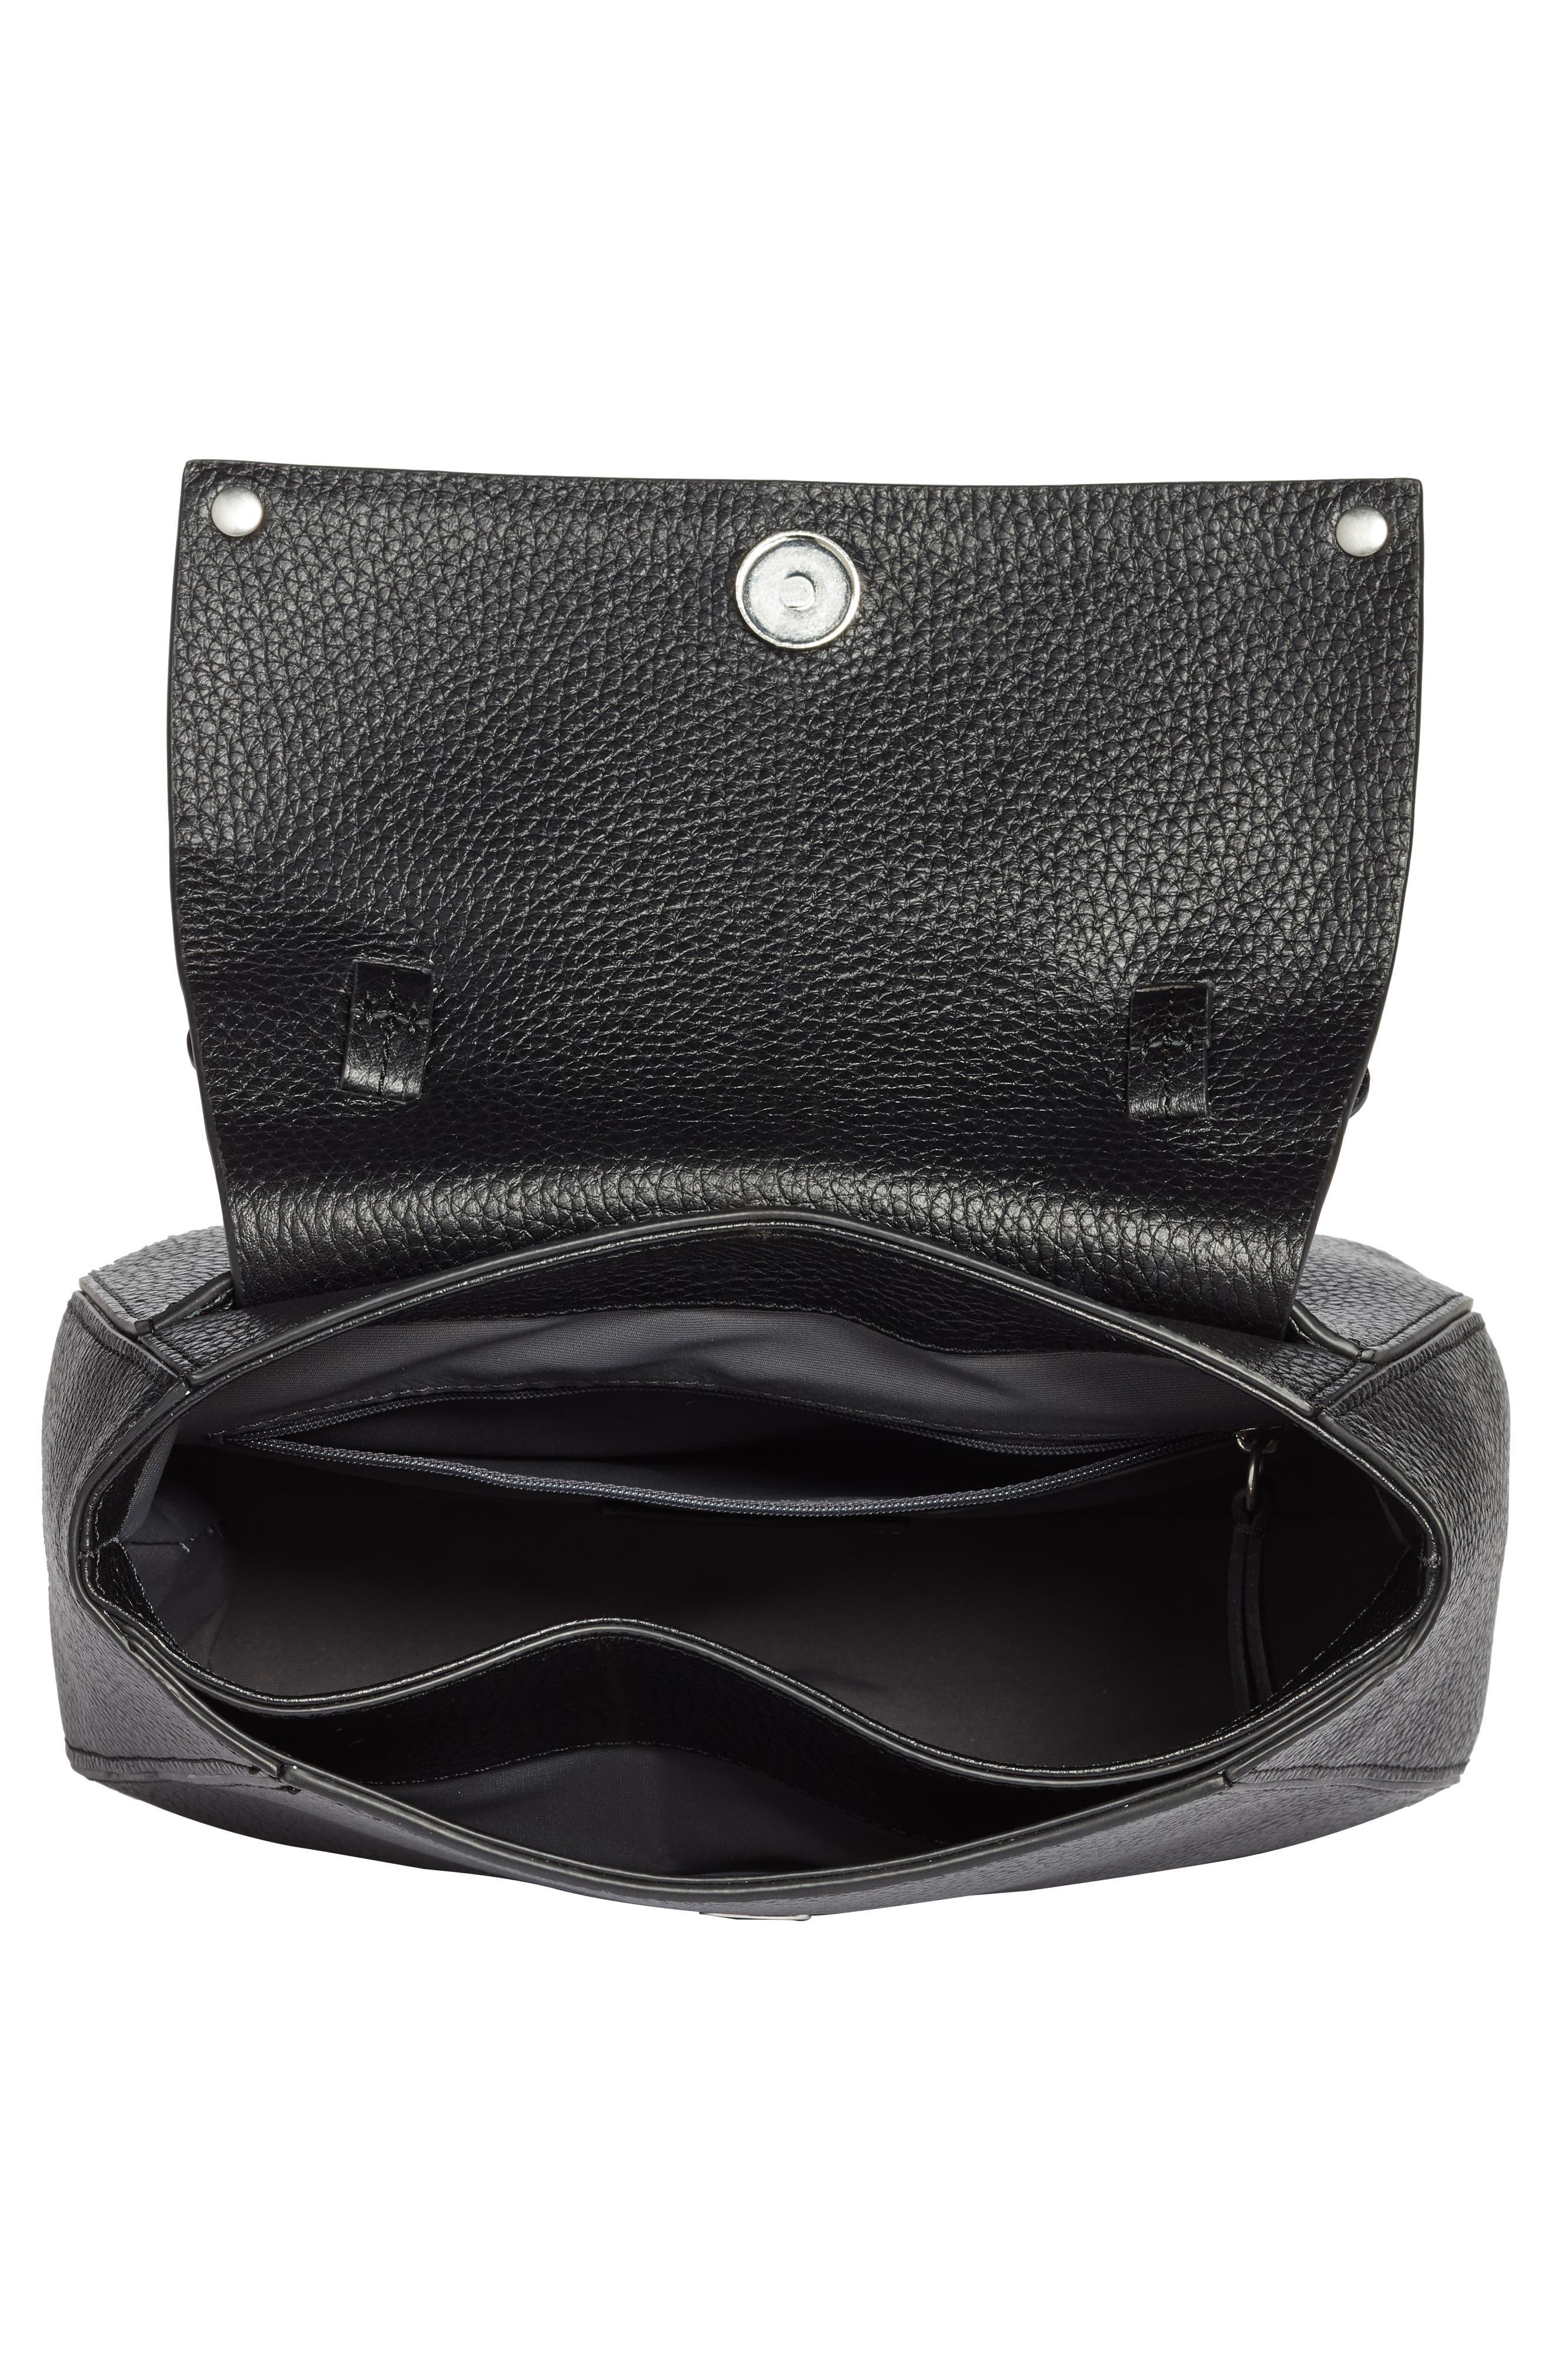 Skyler Leather Top Handle Bag,                             Alternate thumbnail 4, color,                             BLACK